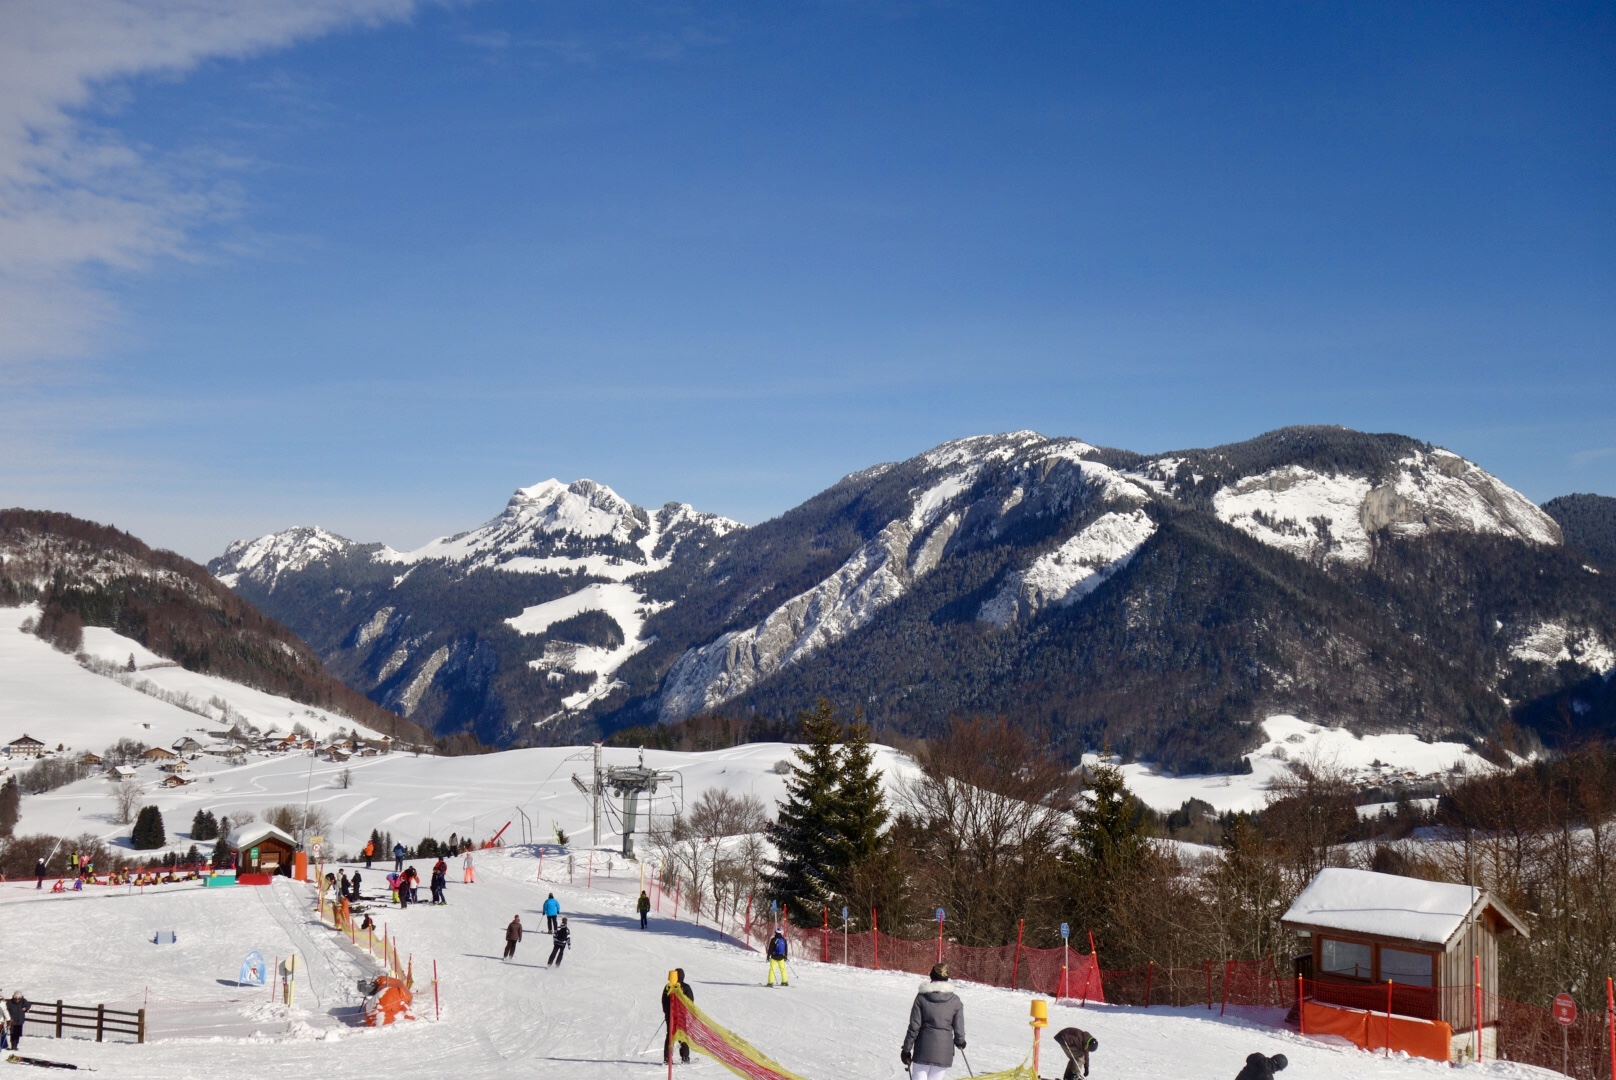 Station de ski d'Hirment